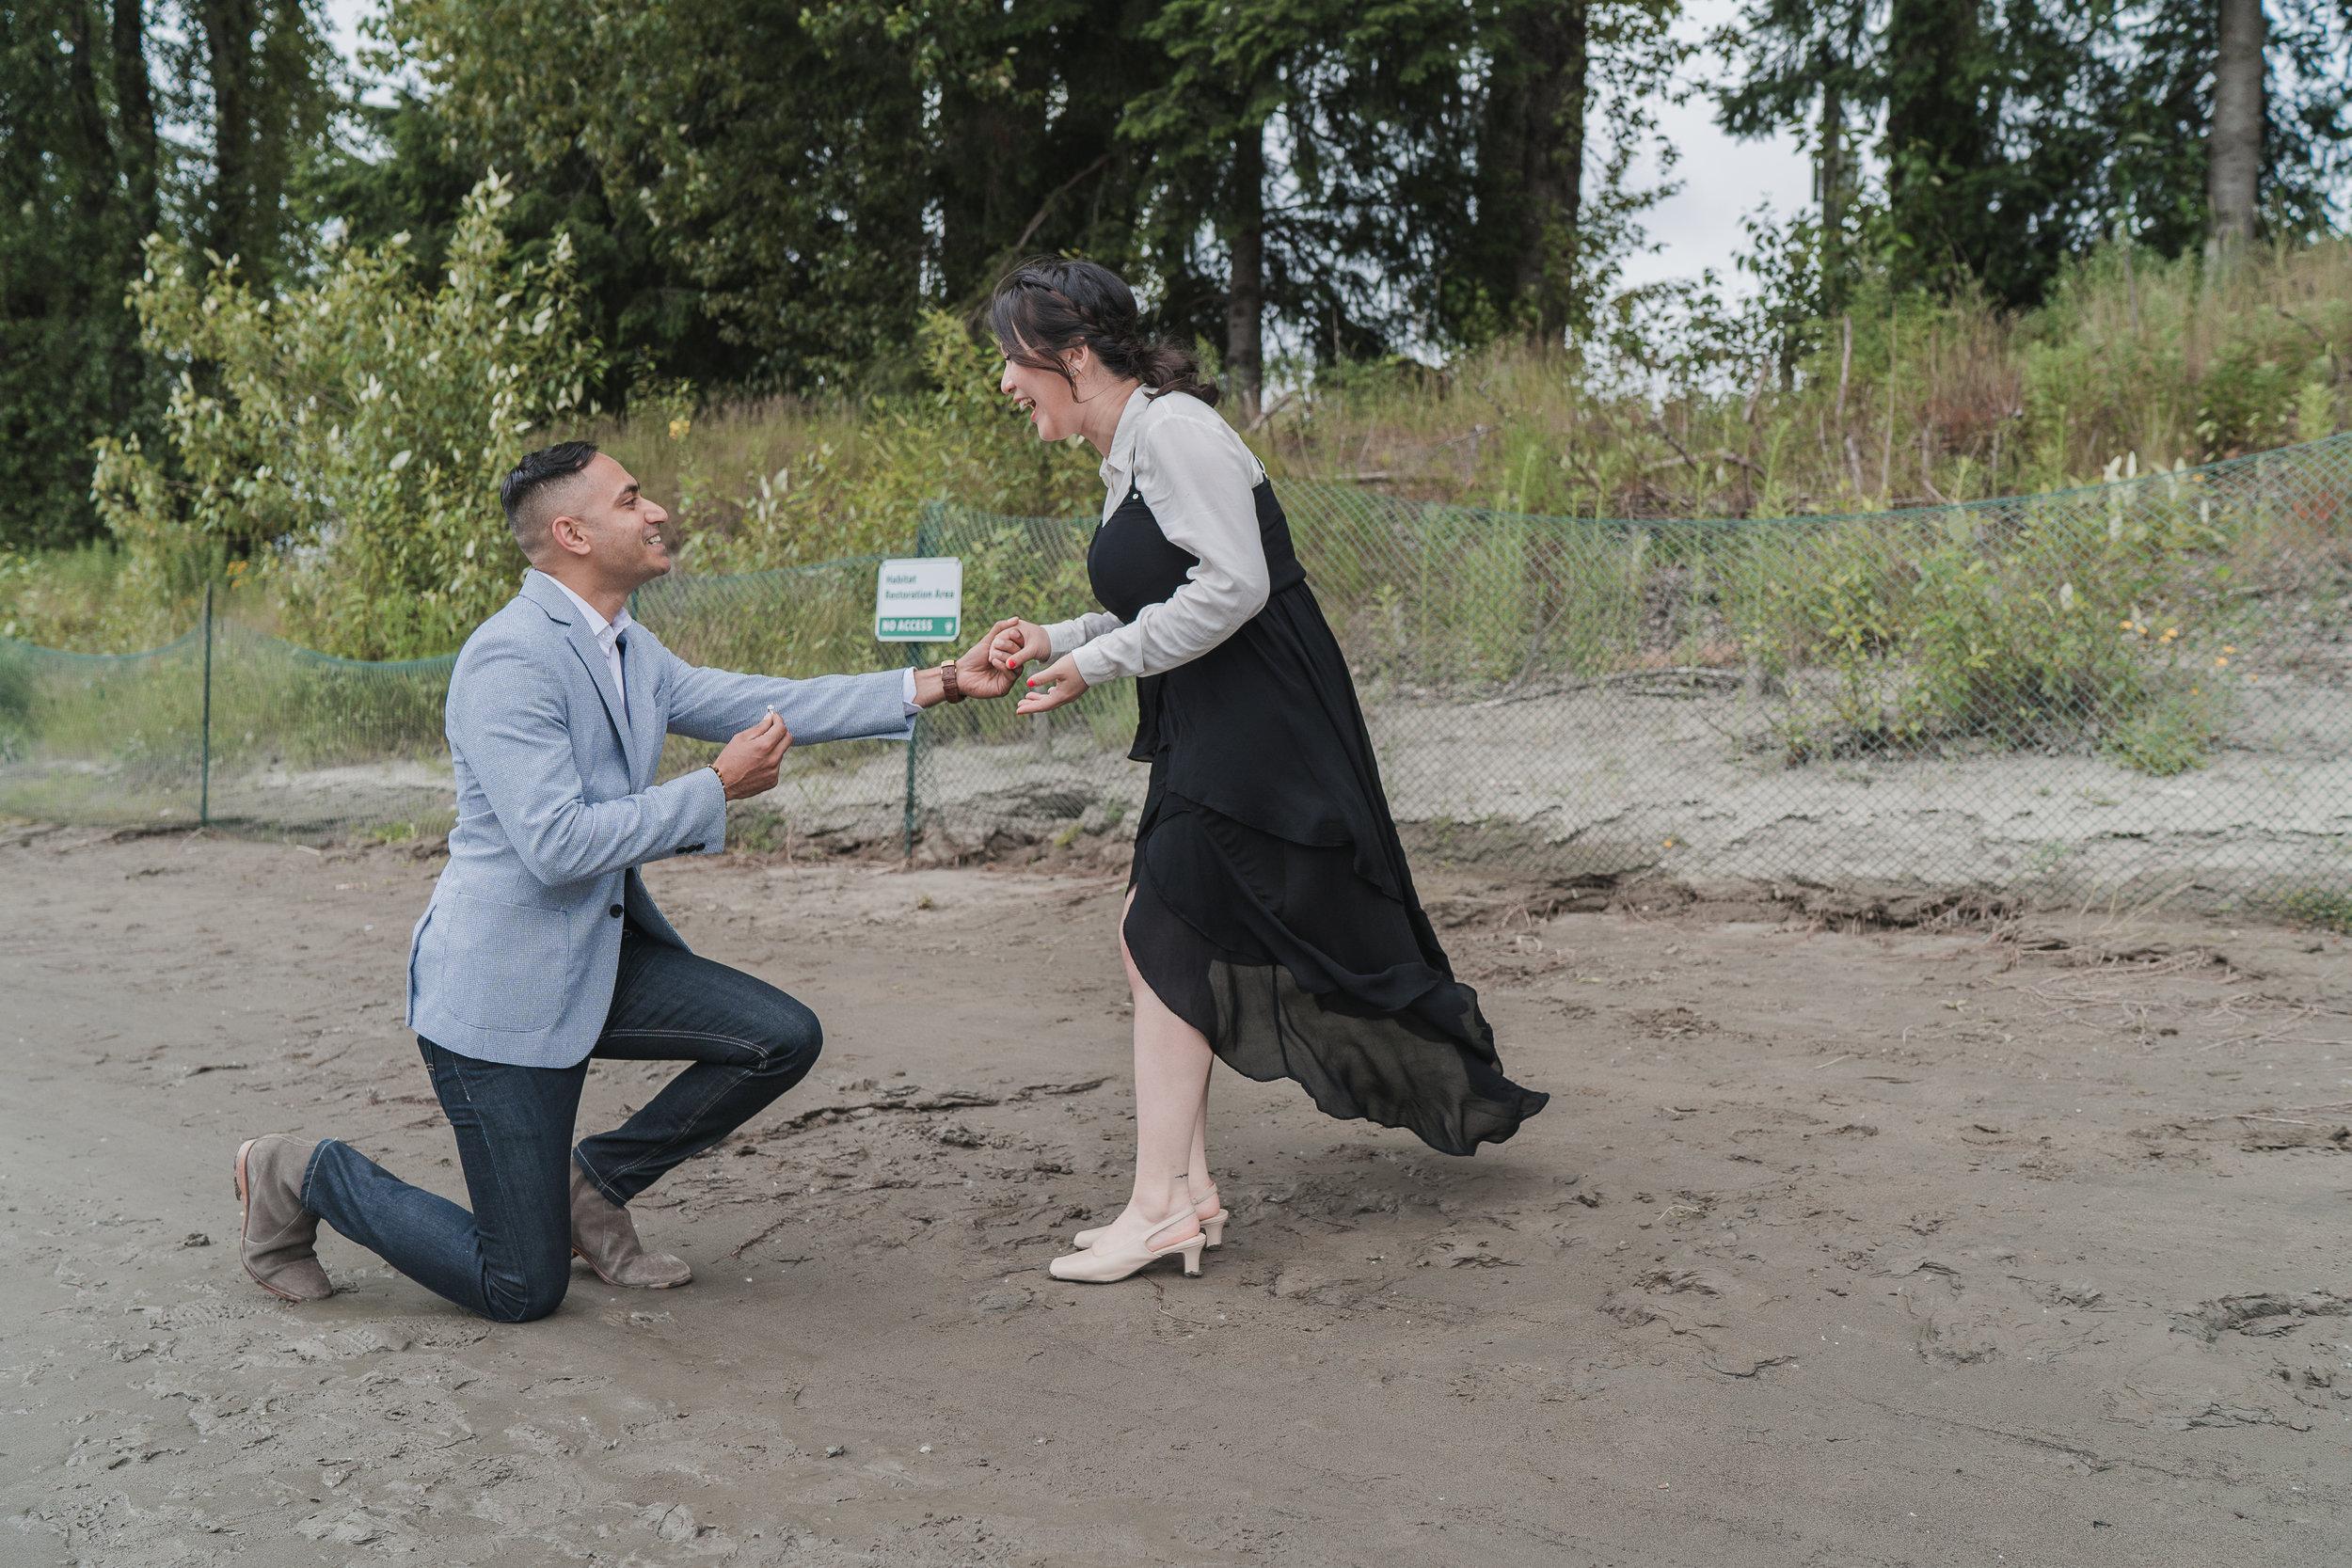 20190622 - Monika & Johnson Engagement- 0031.jpg